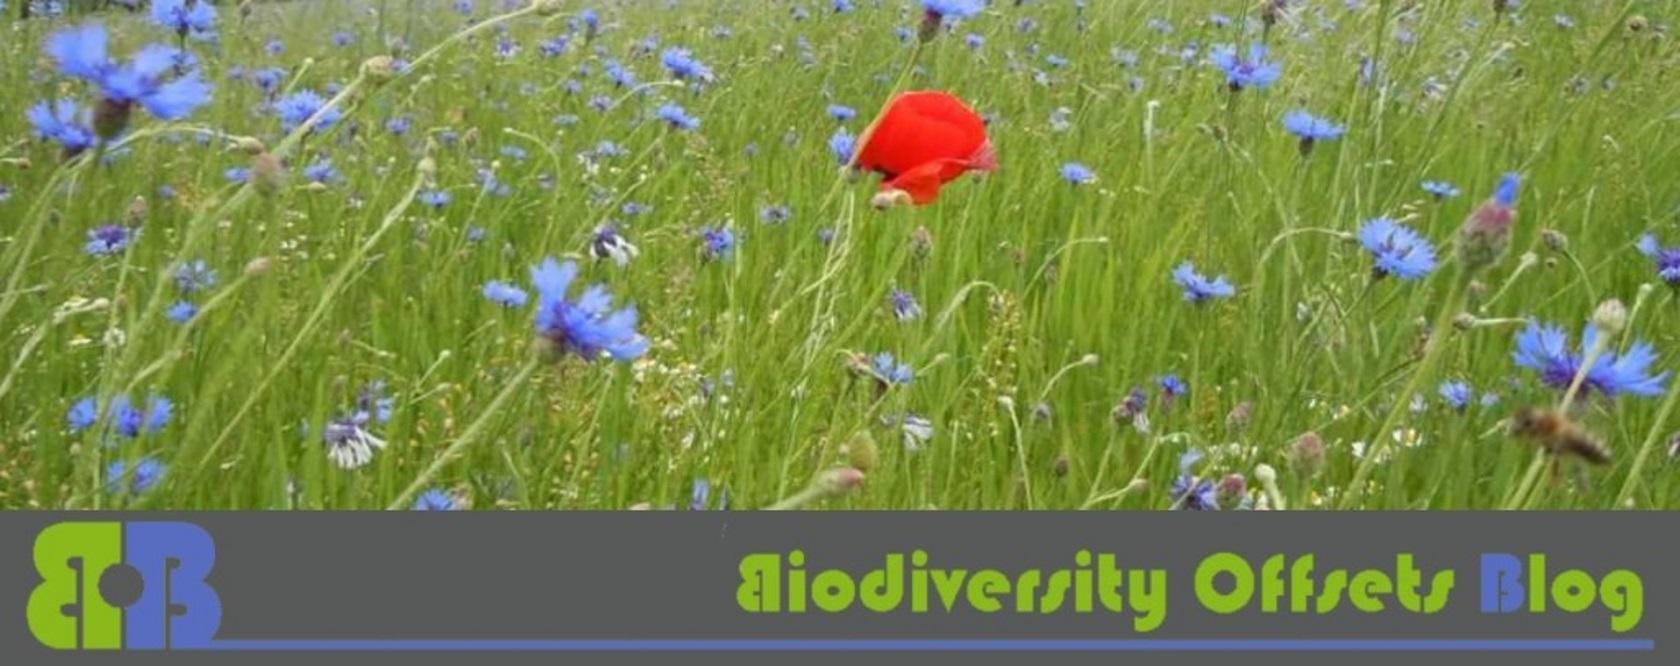 Biodiversity-Offsets-Blog-Logo_hellgruen_Kornblumen-1680x666